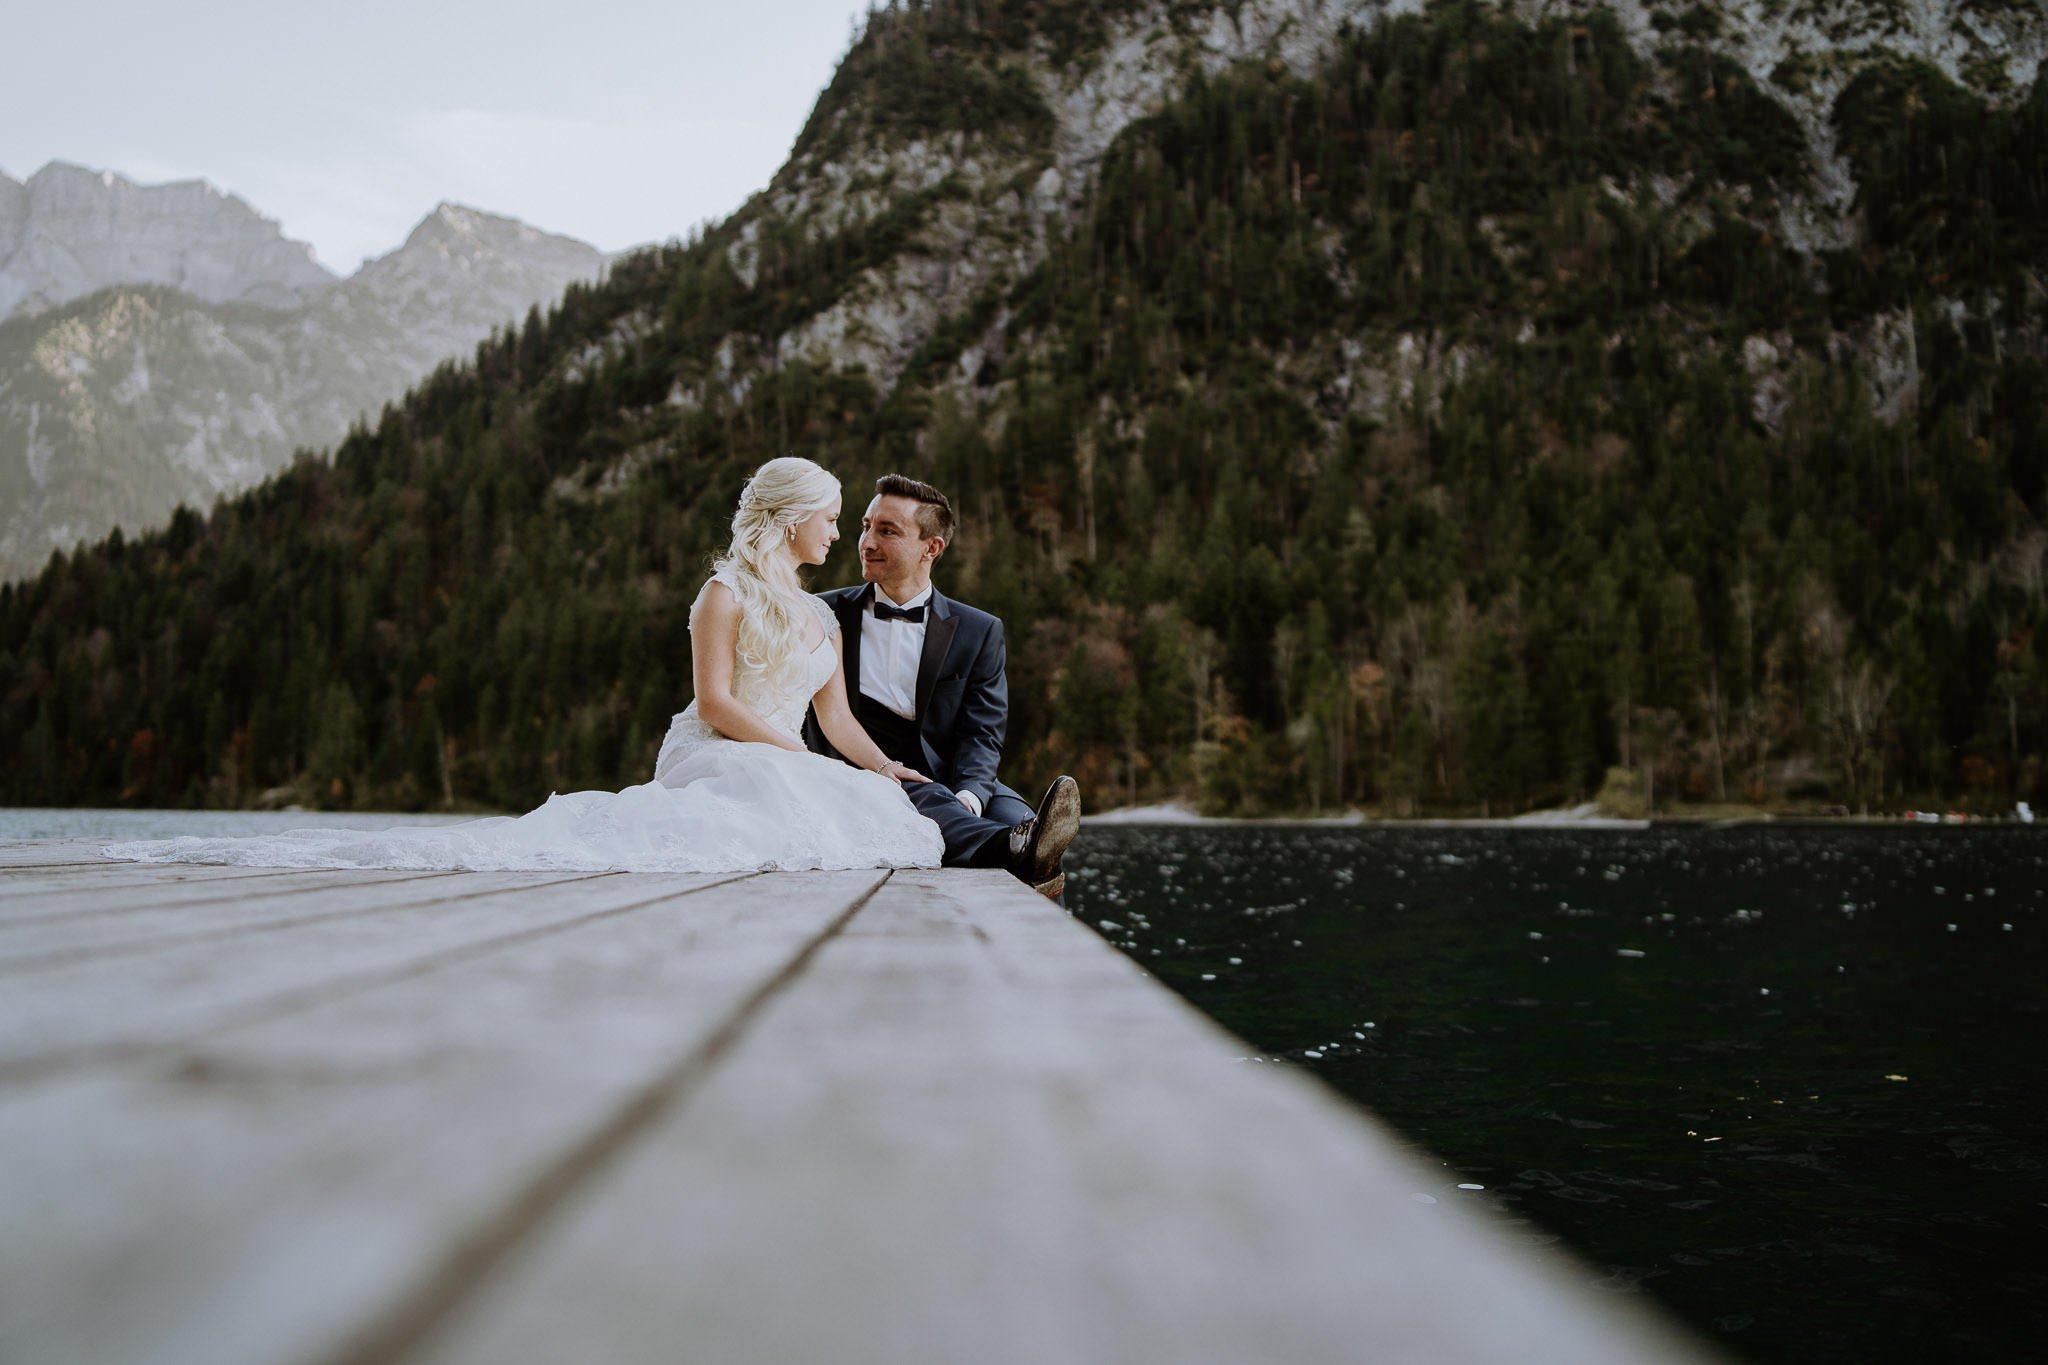 wedding photographer hamilton new zealand 21